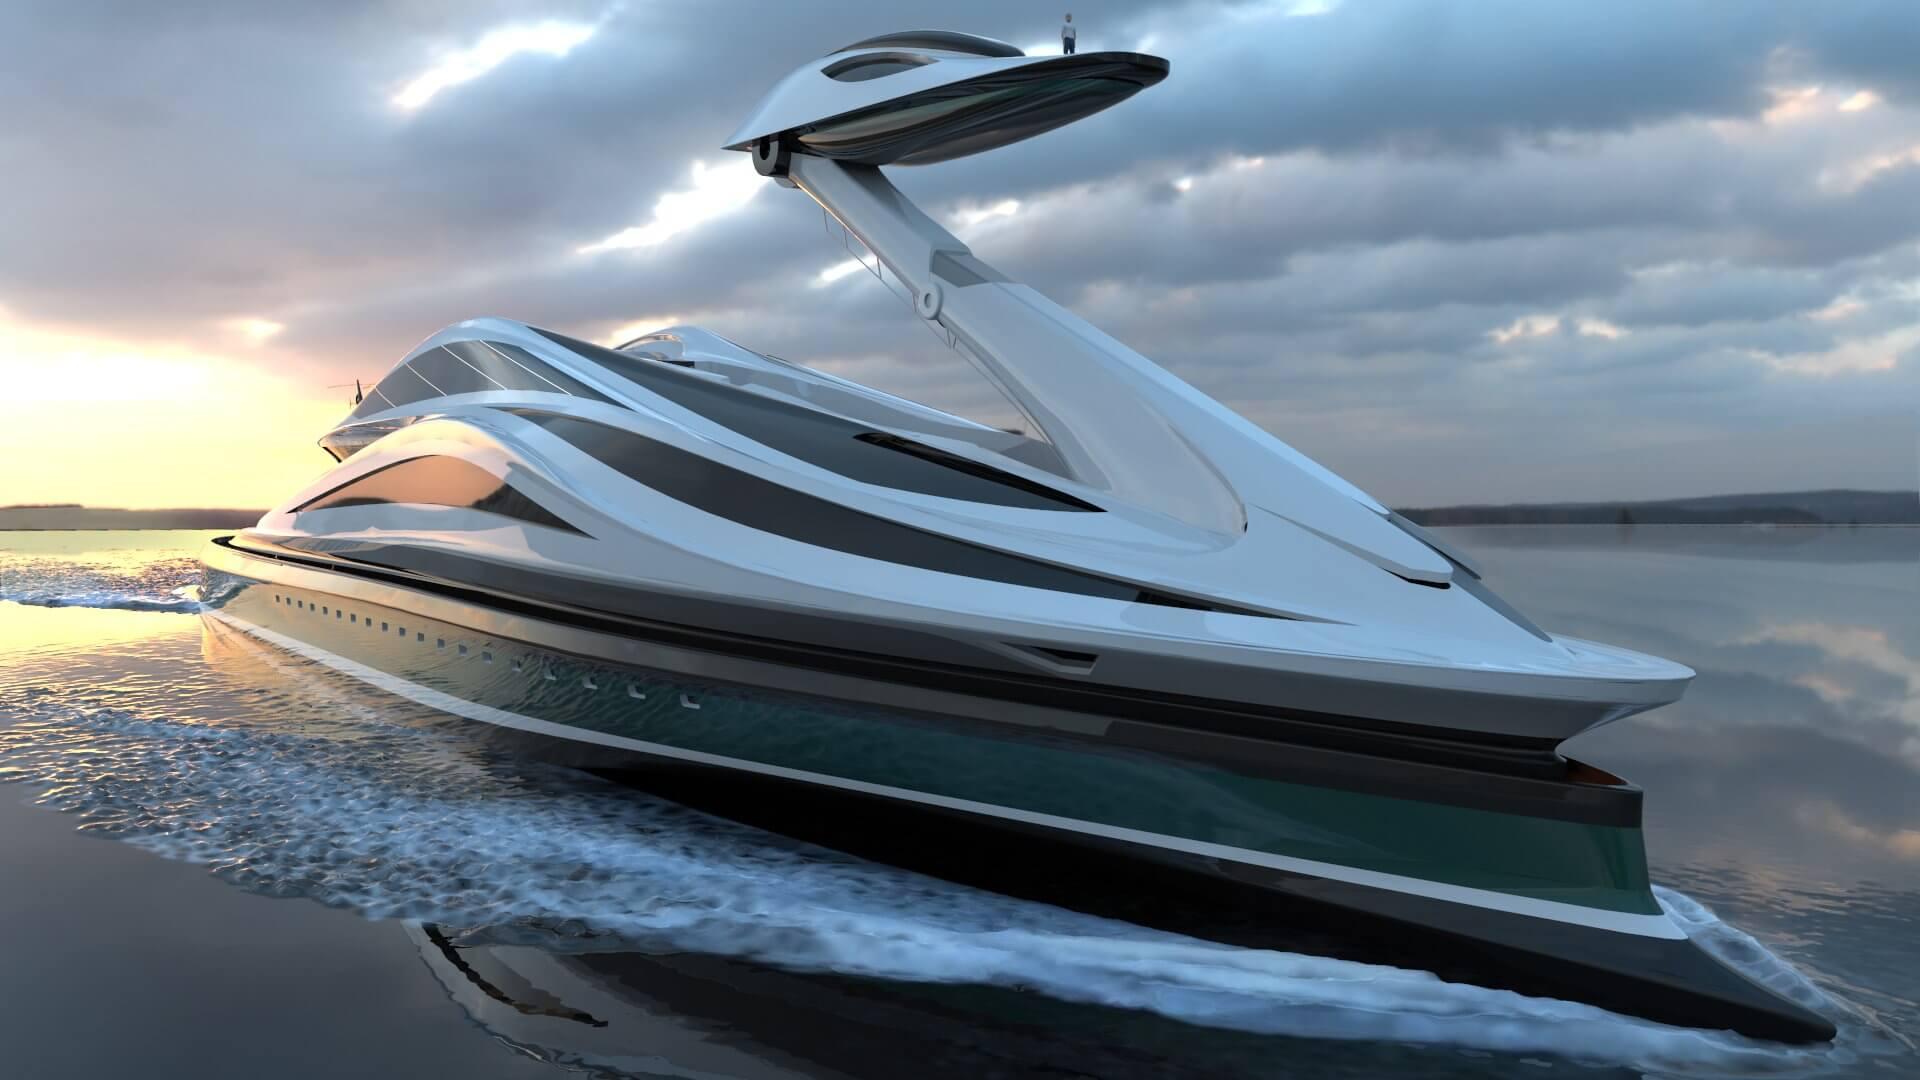 Superyacht Concept Avanguardia The Swan by Lazzarini Studio Design 137 metres platform